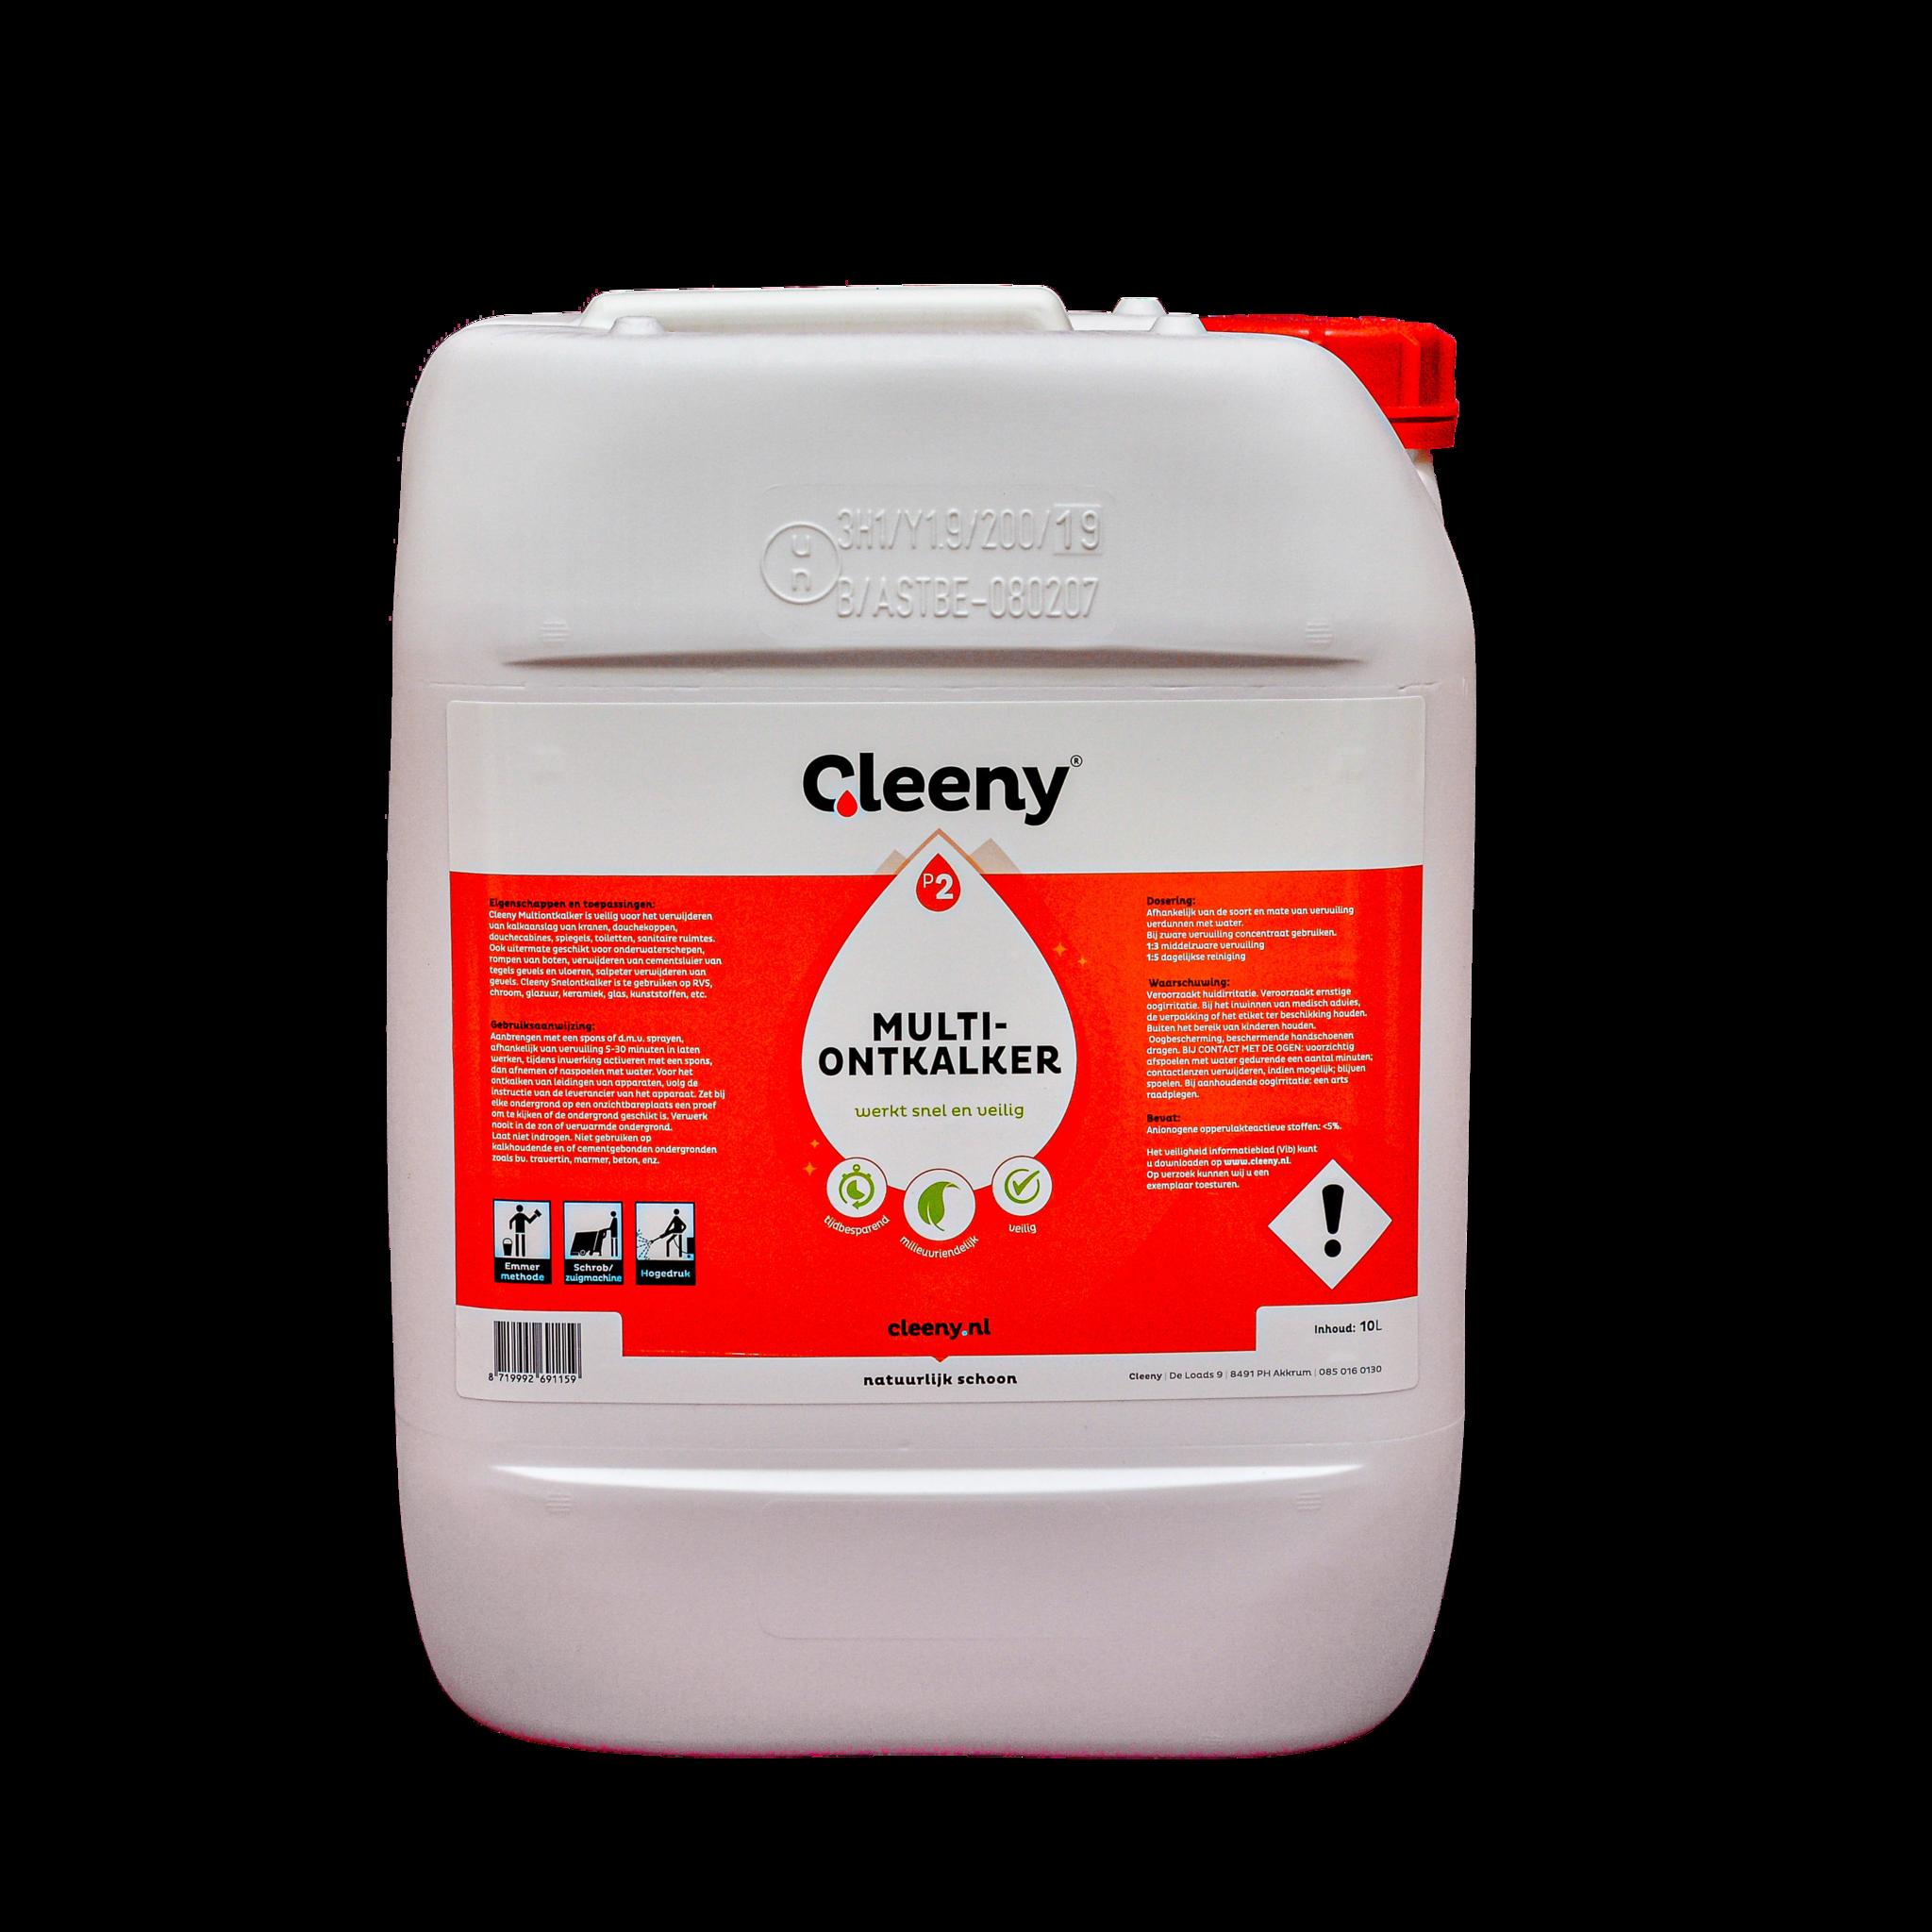 Cleeny P2 Multi ontkalker 10 liter kan concentraat